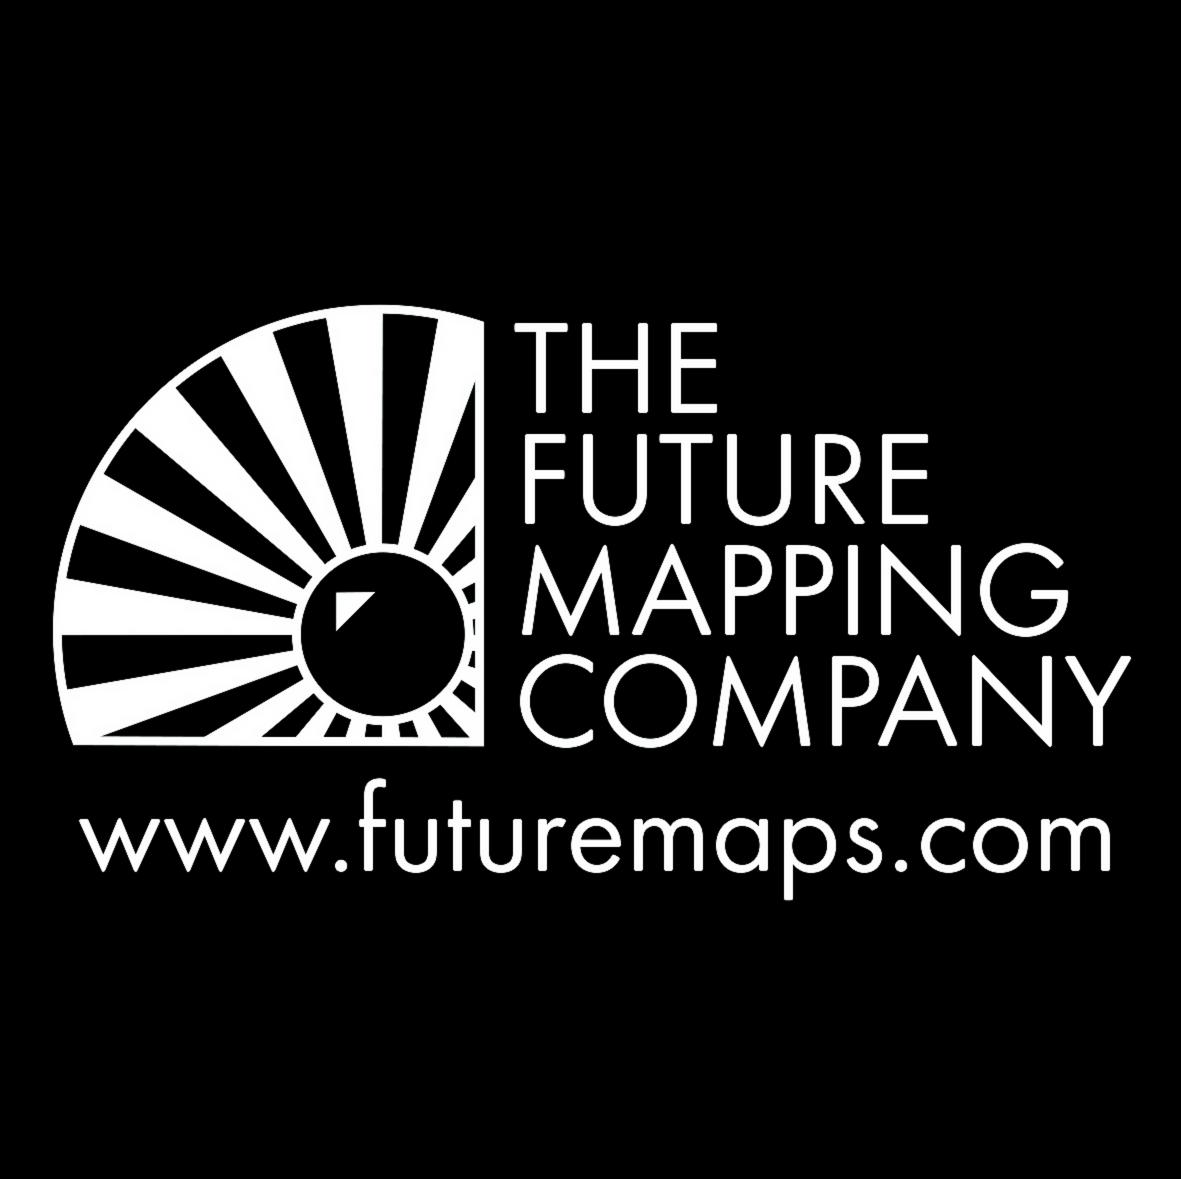 Future Mapping Company